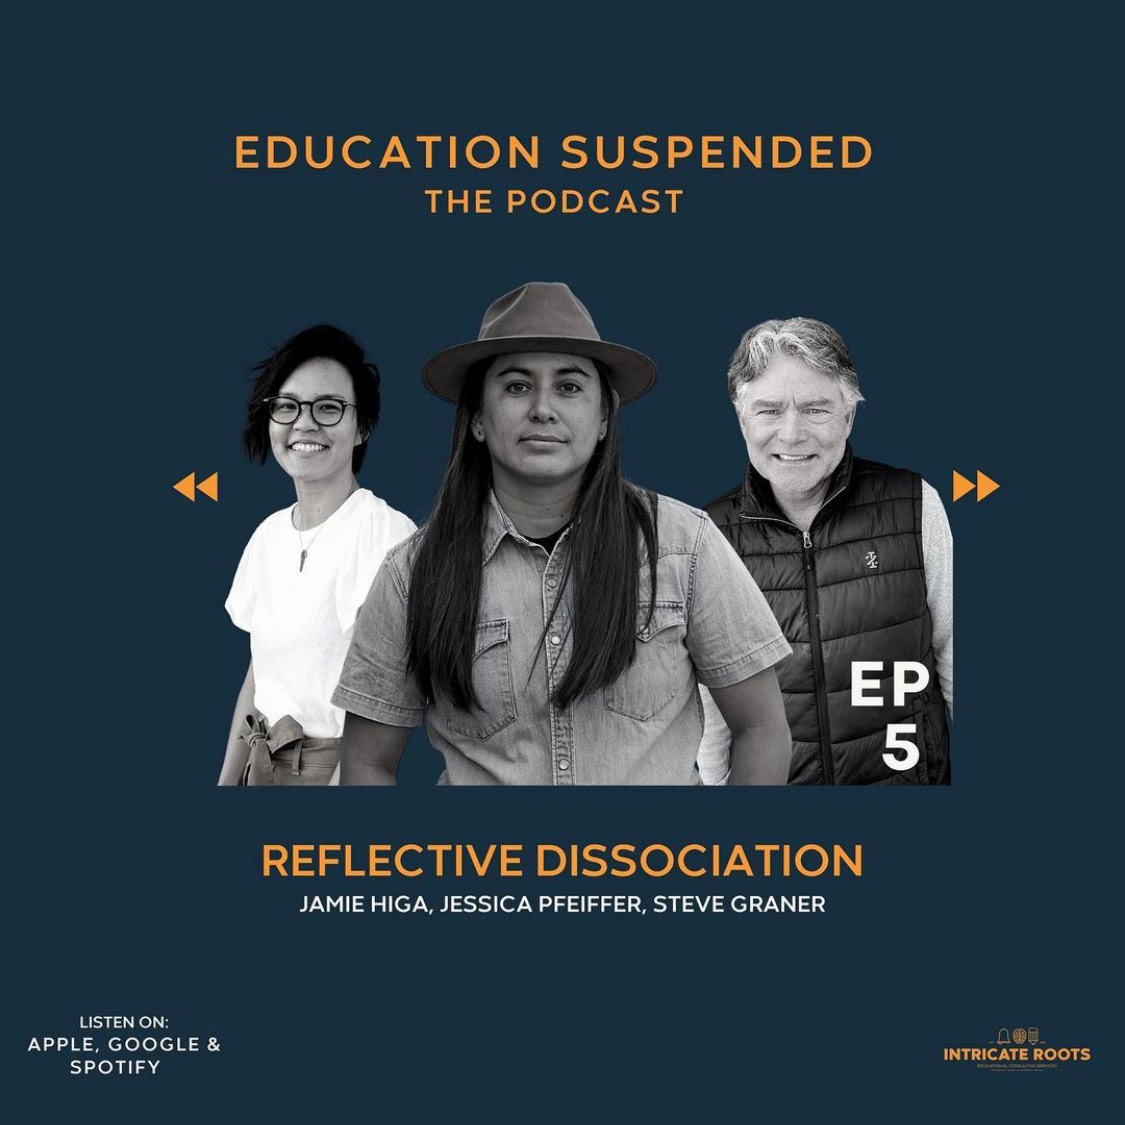 Episode 5: Reflective Dissociation